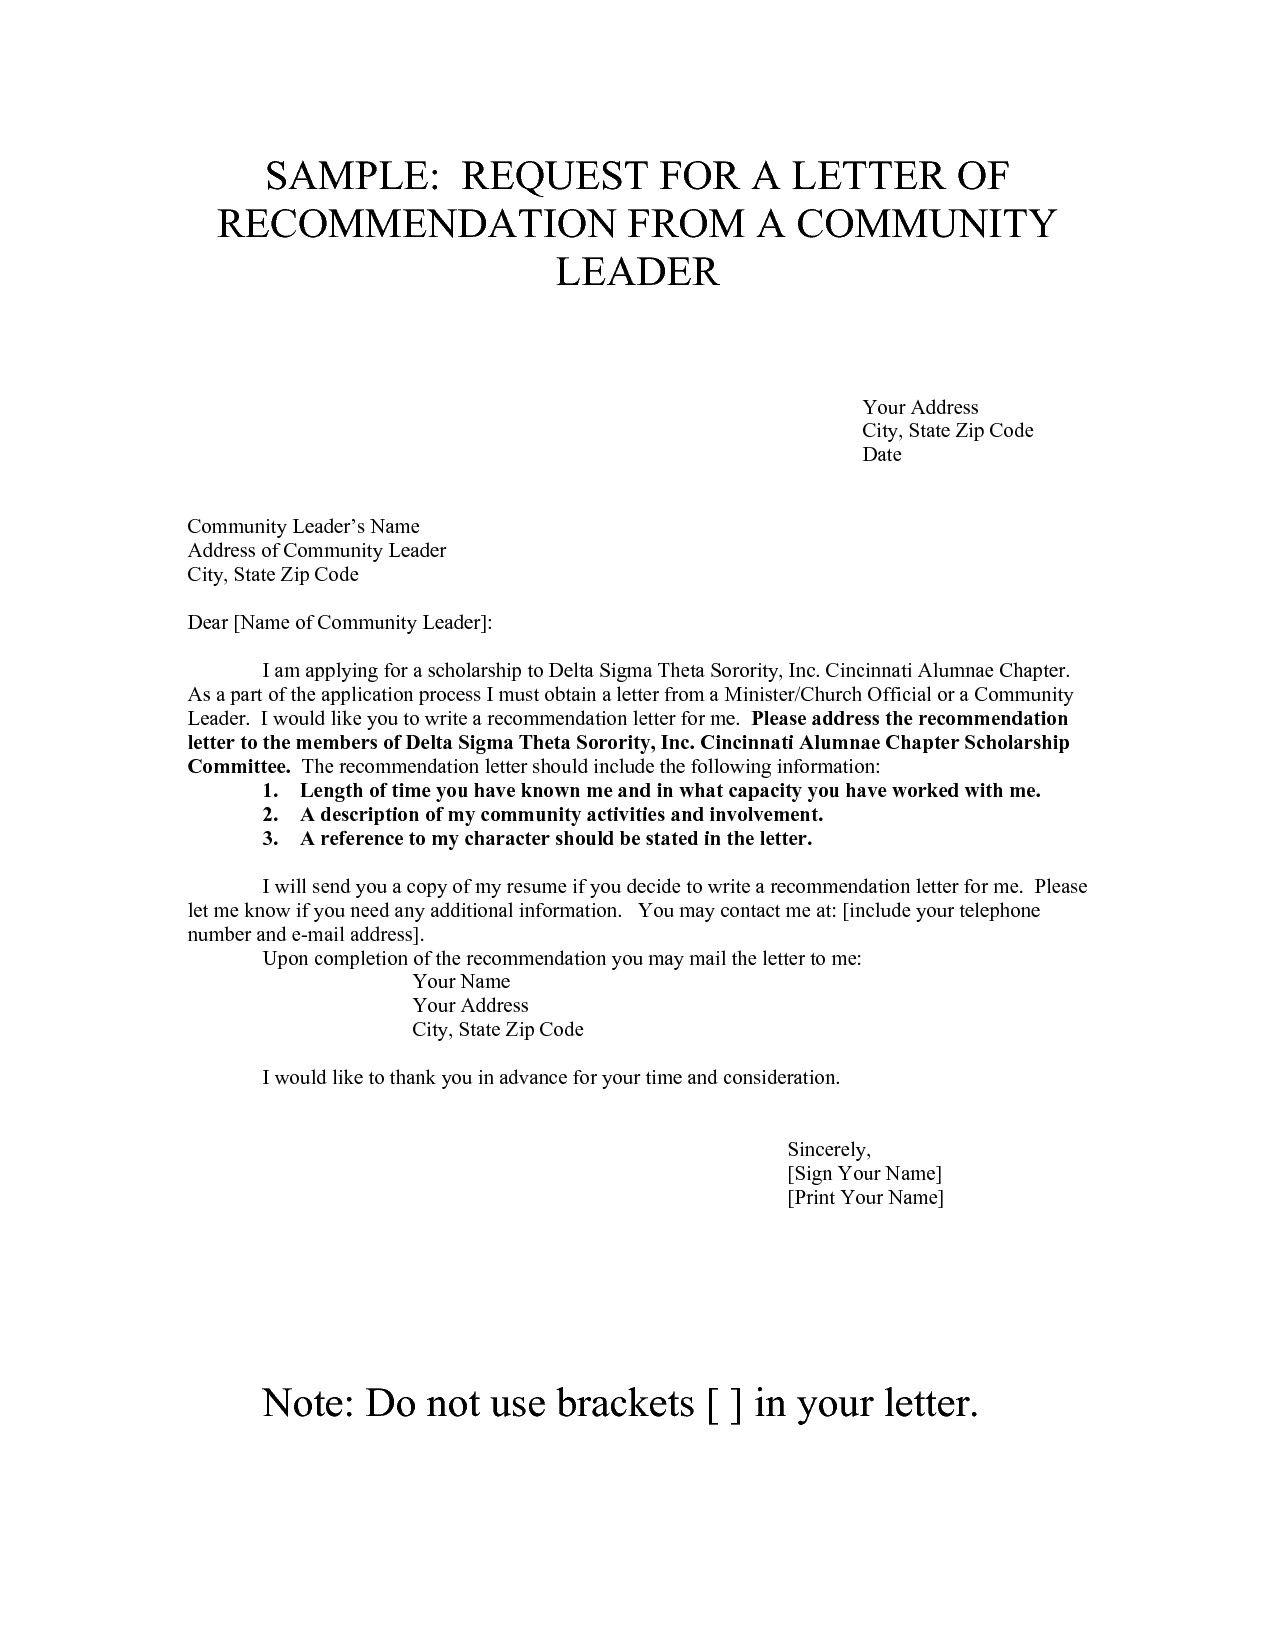 Image Result For Reference Letter For A Job Sorority Recommendation Letter Letter Of Recommendation Lettering Copy of a reference letter